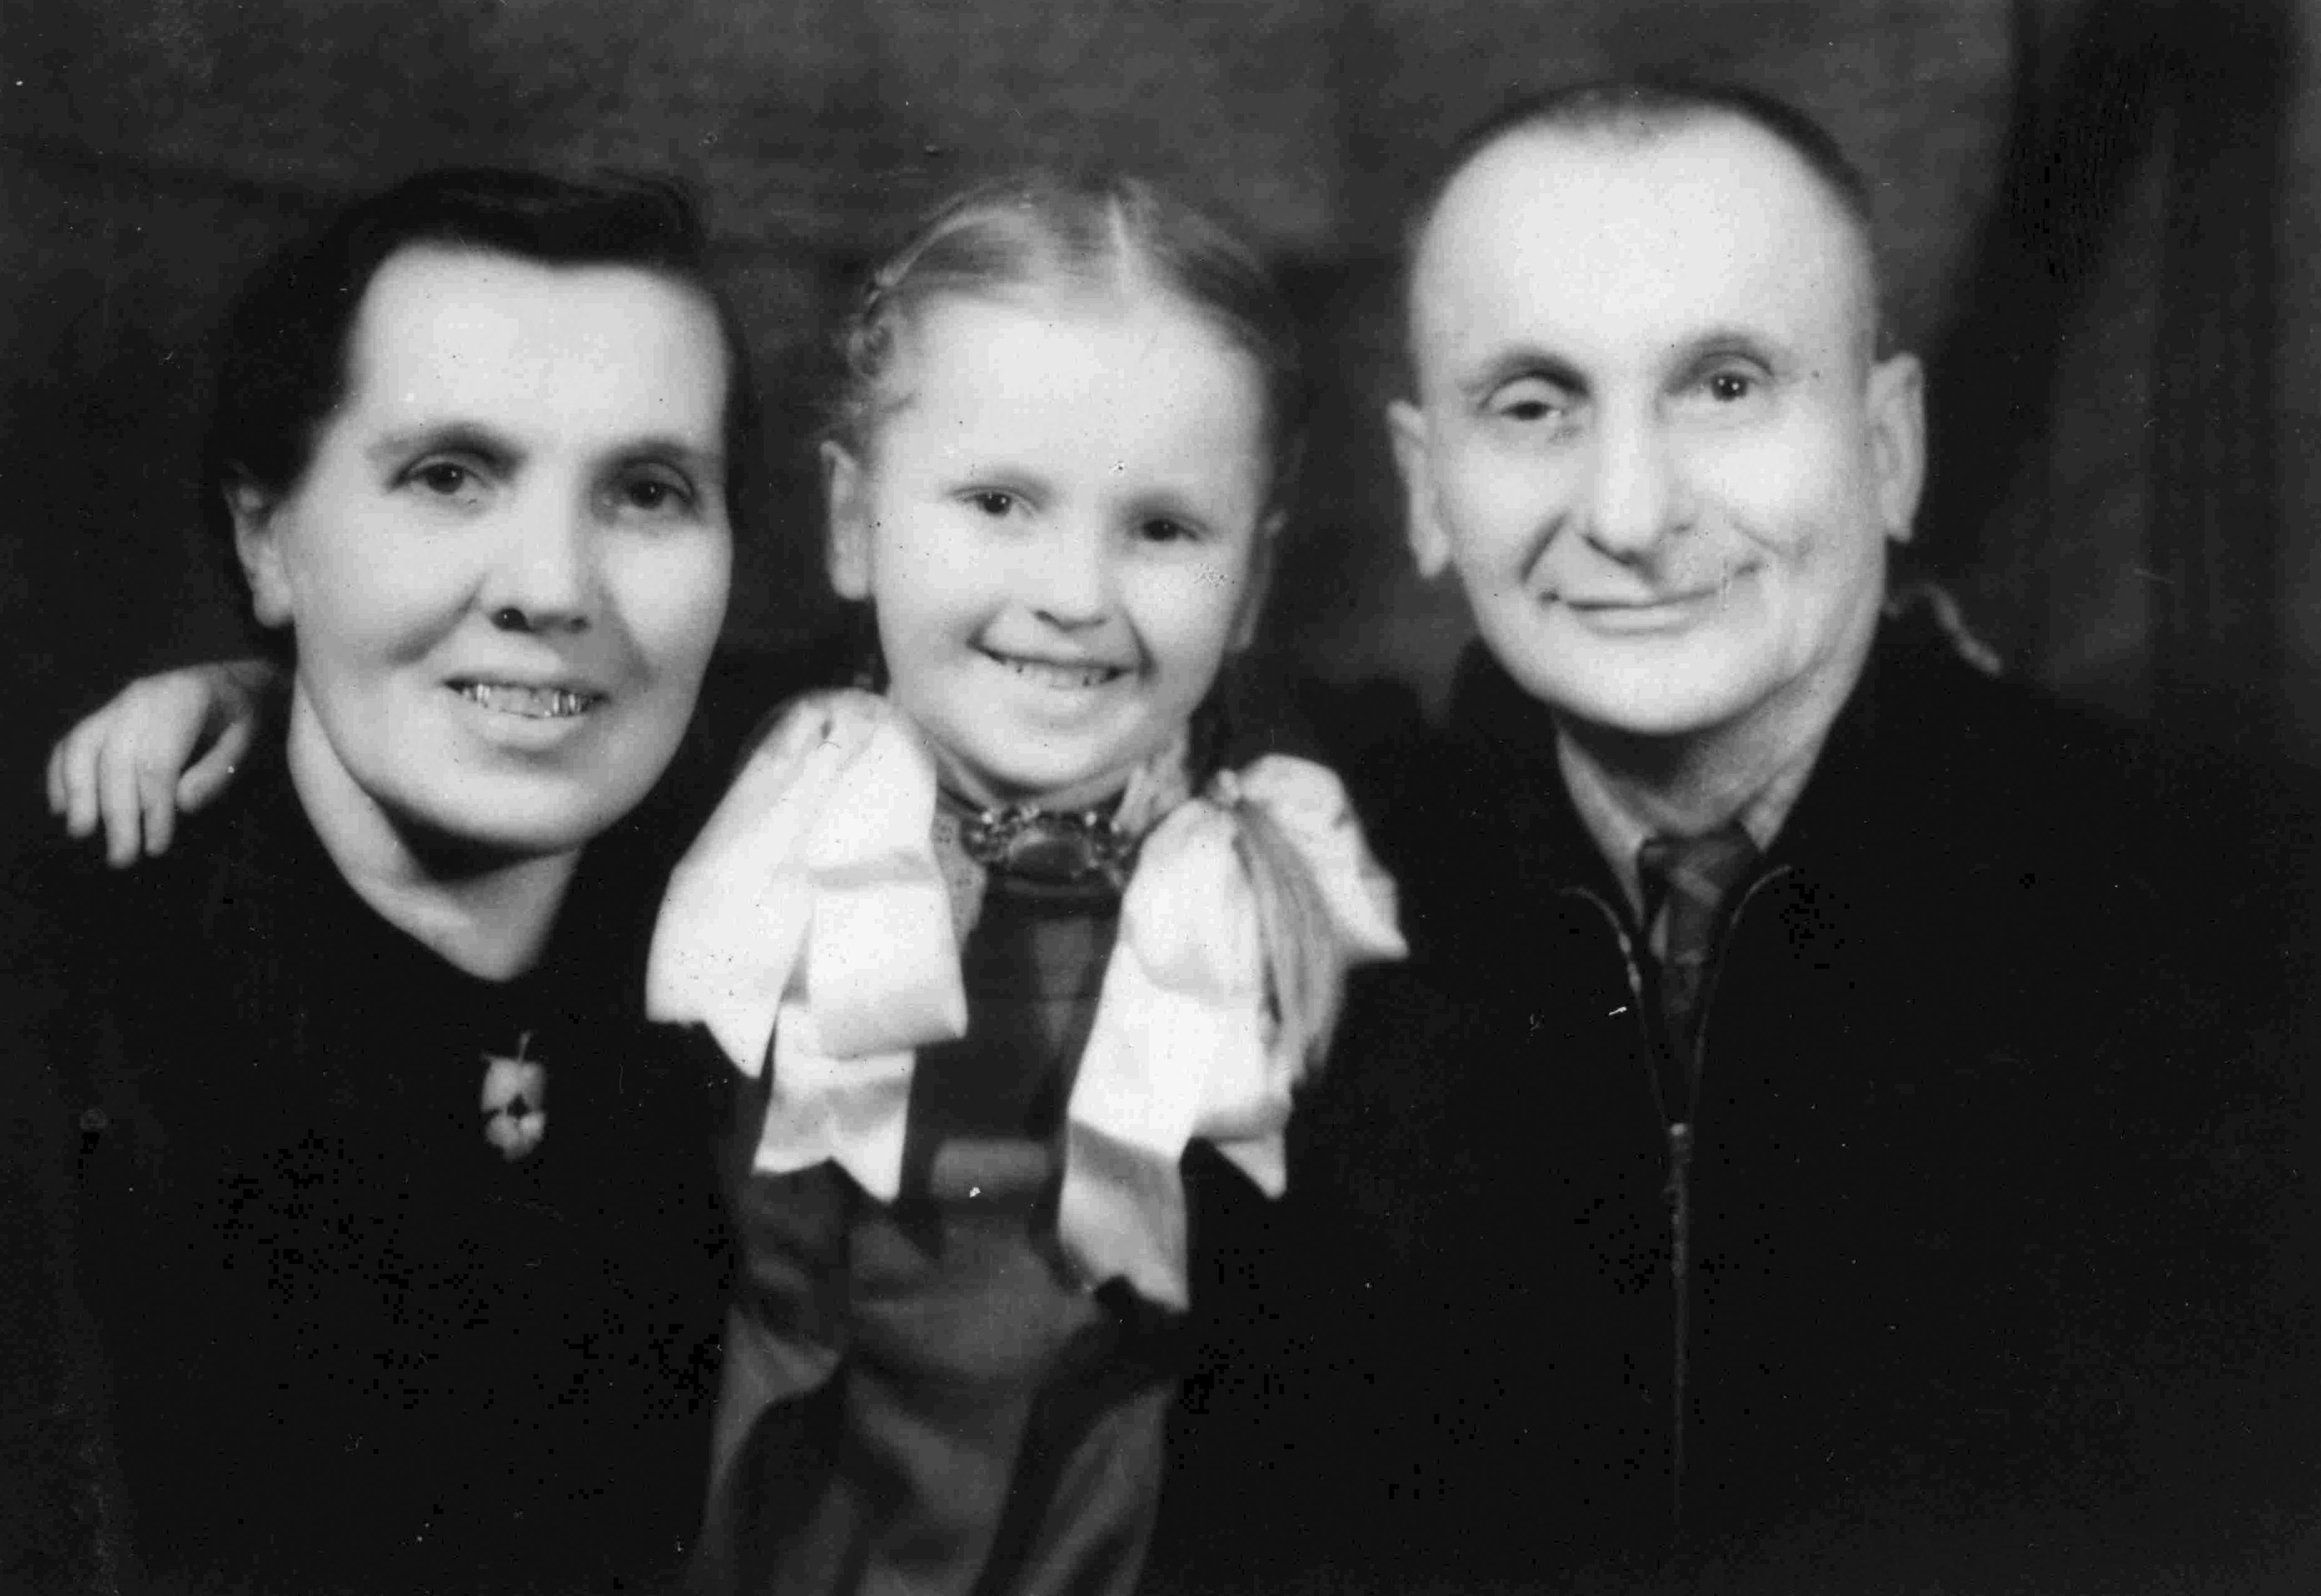 http://wt32a2t.atease.lt/uploads/userfiles/zuvanciuju_gelbejimo_kryziaus/Dominykas-ir-Stanislava-Mižutavičiai-su-dukra-Stanislava-Elenute.jpg